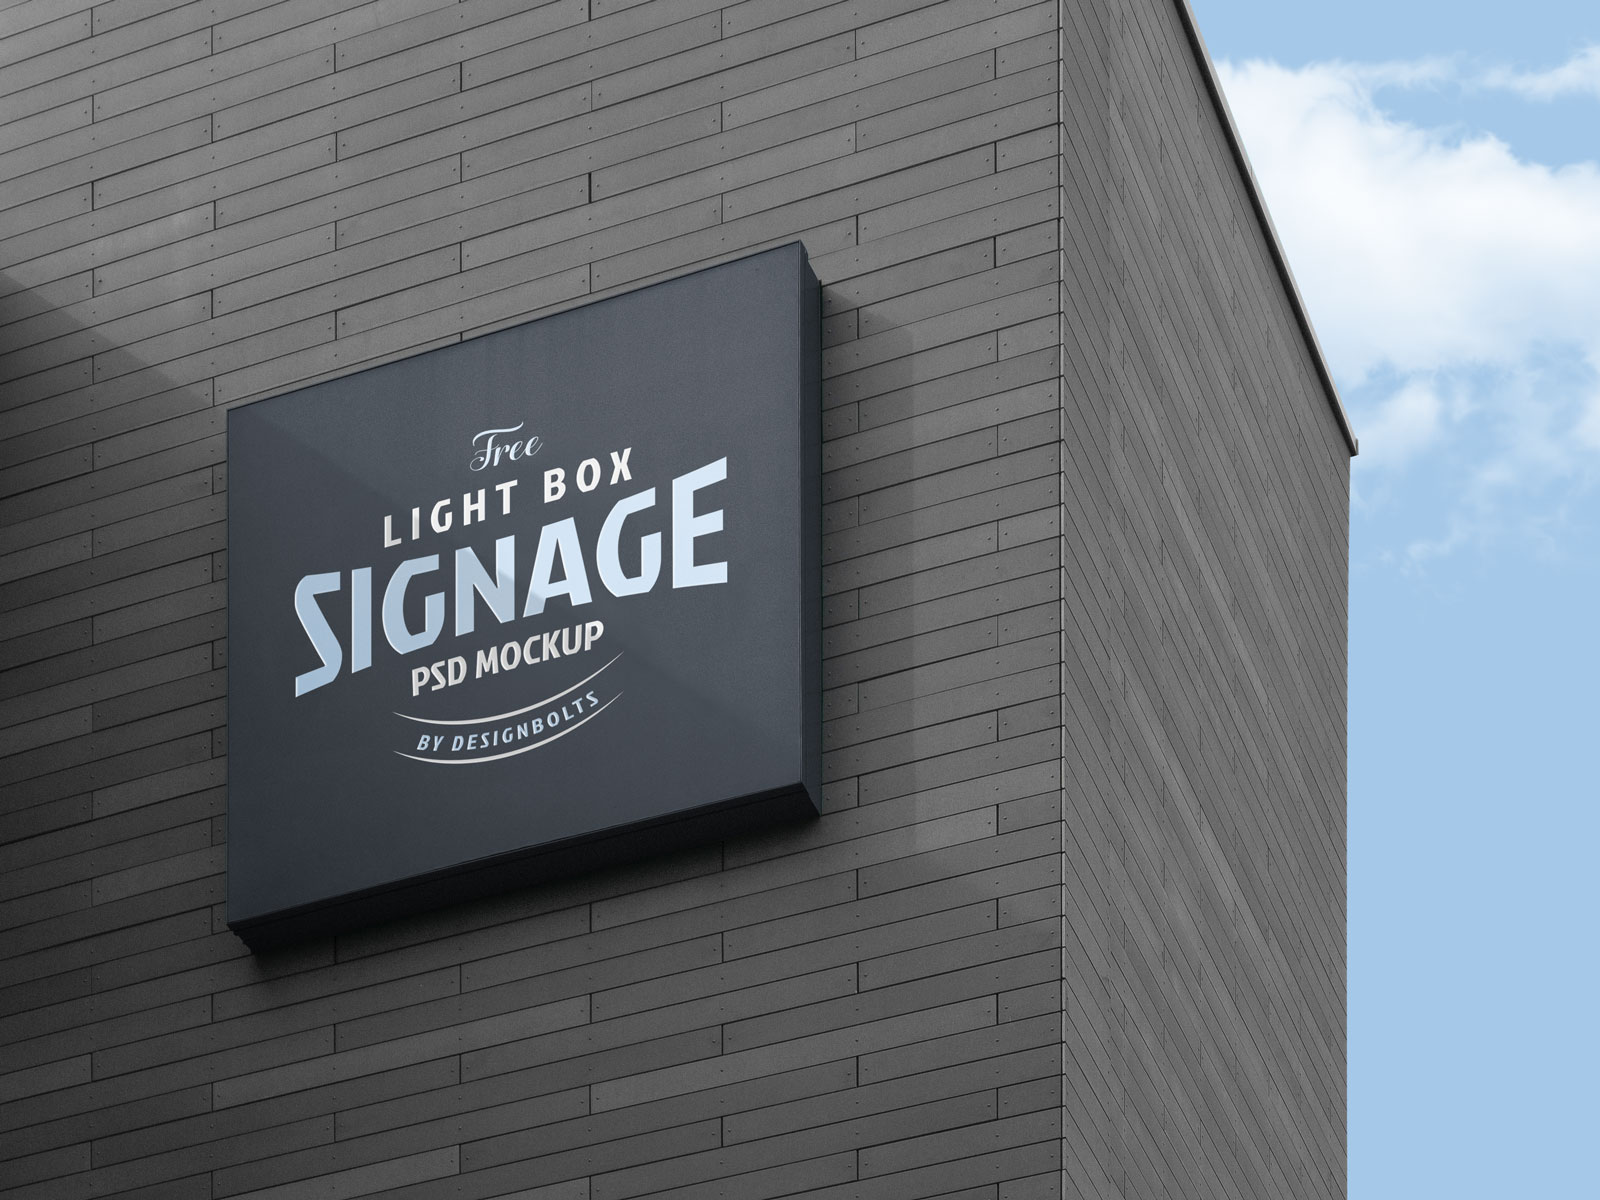 Wall Mounted Signage Mockup